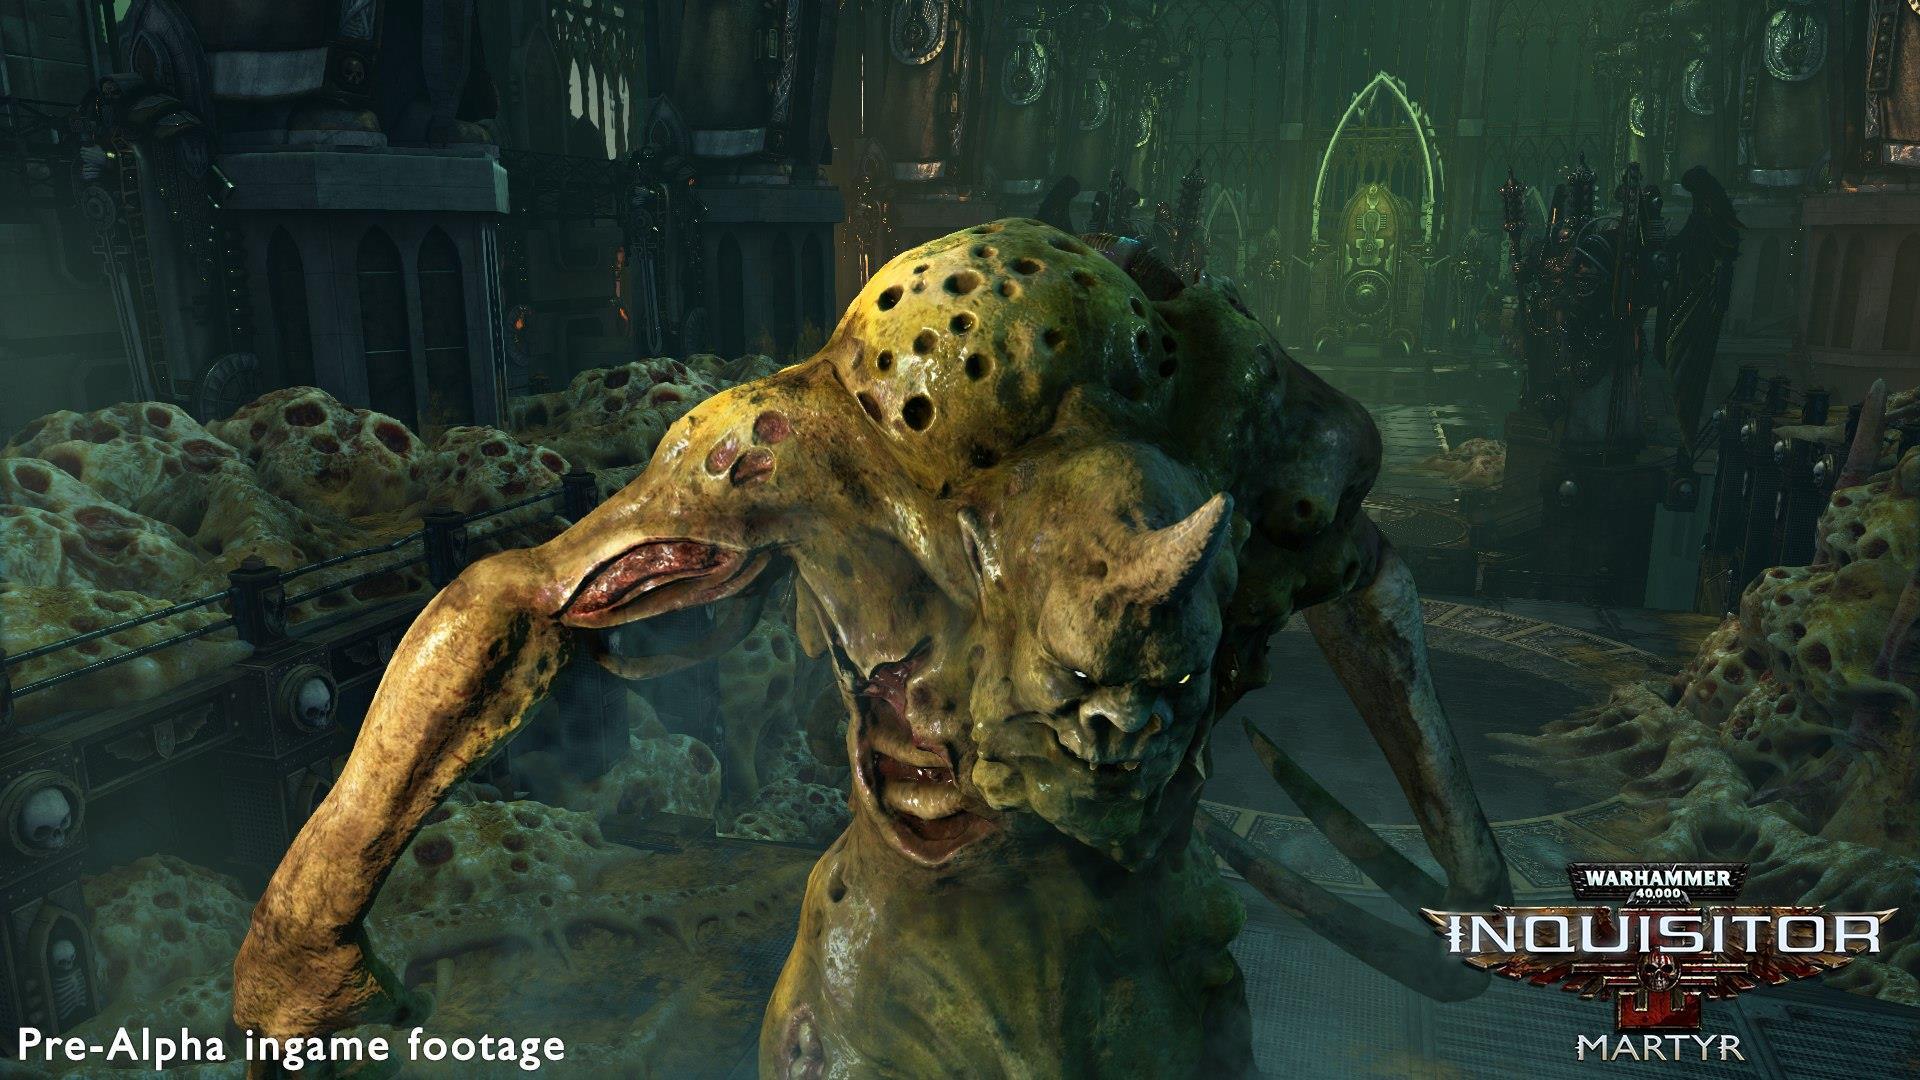 [Jeu vidéo] Warhammer 40,000: Inquisitor – Martyr 469174117920078696653230689381853462635666230584o